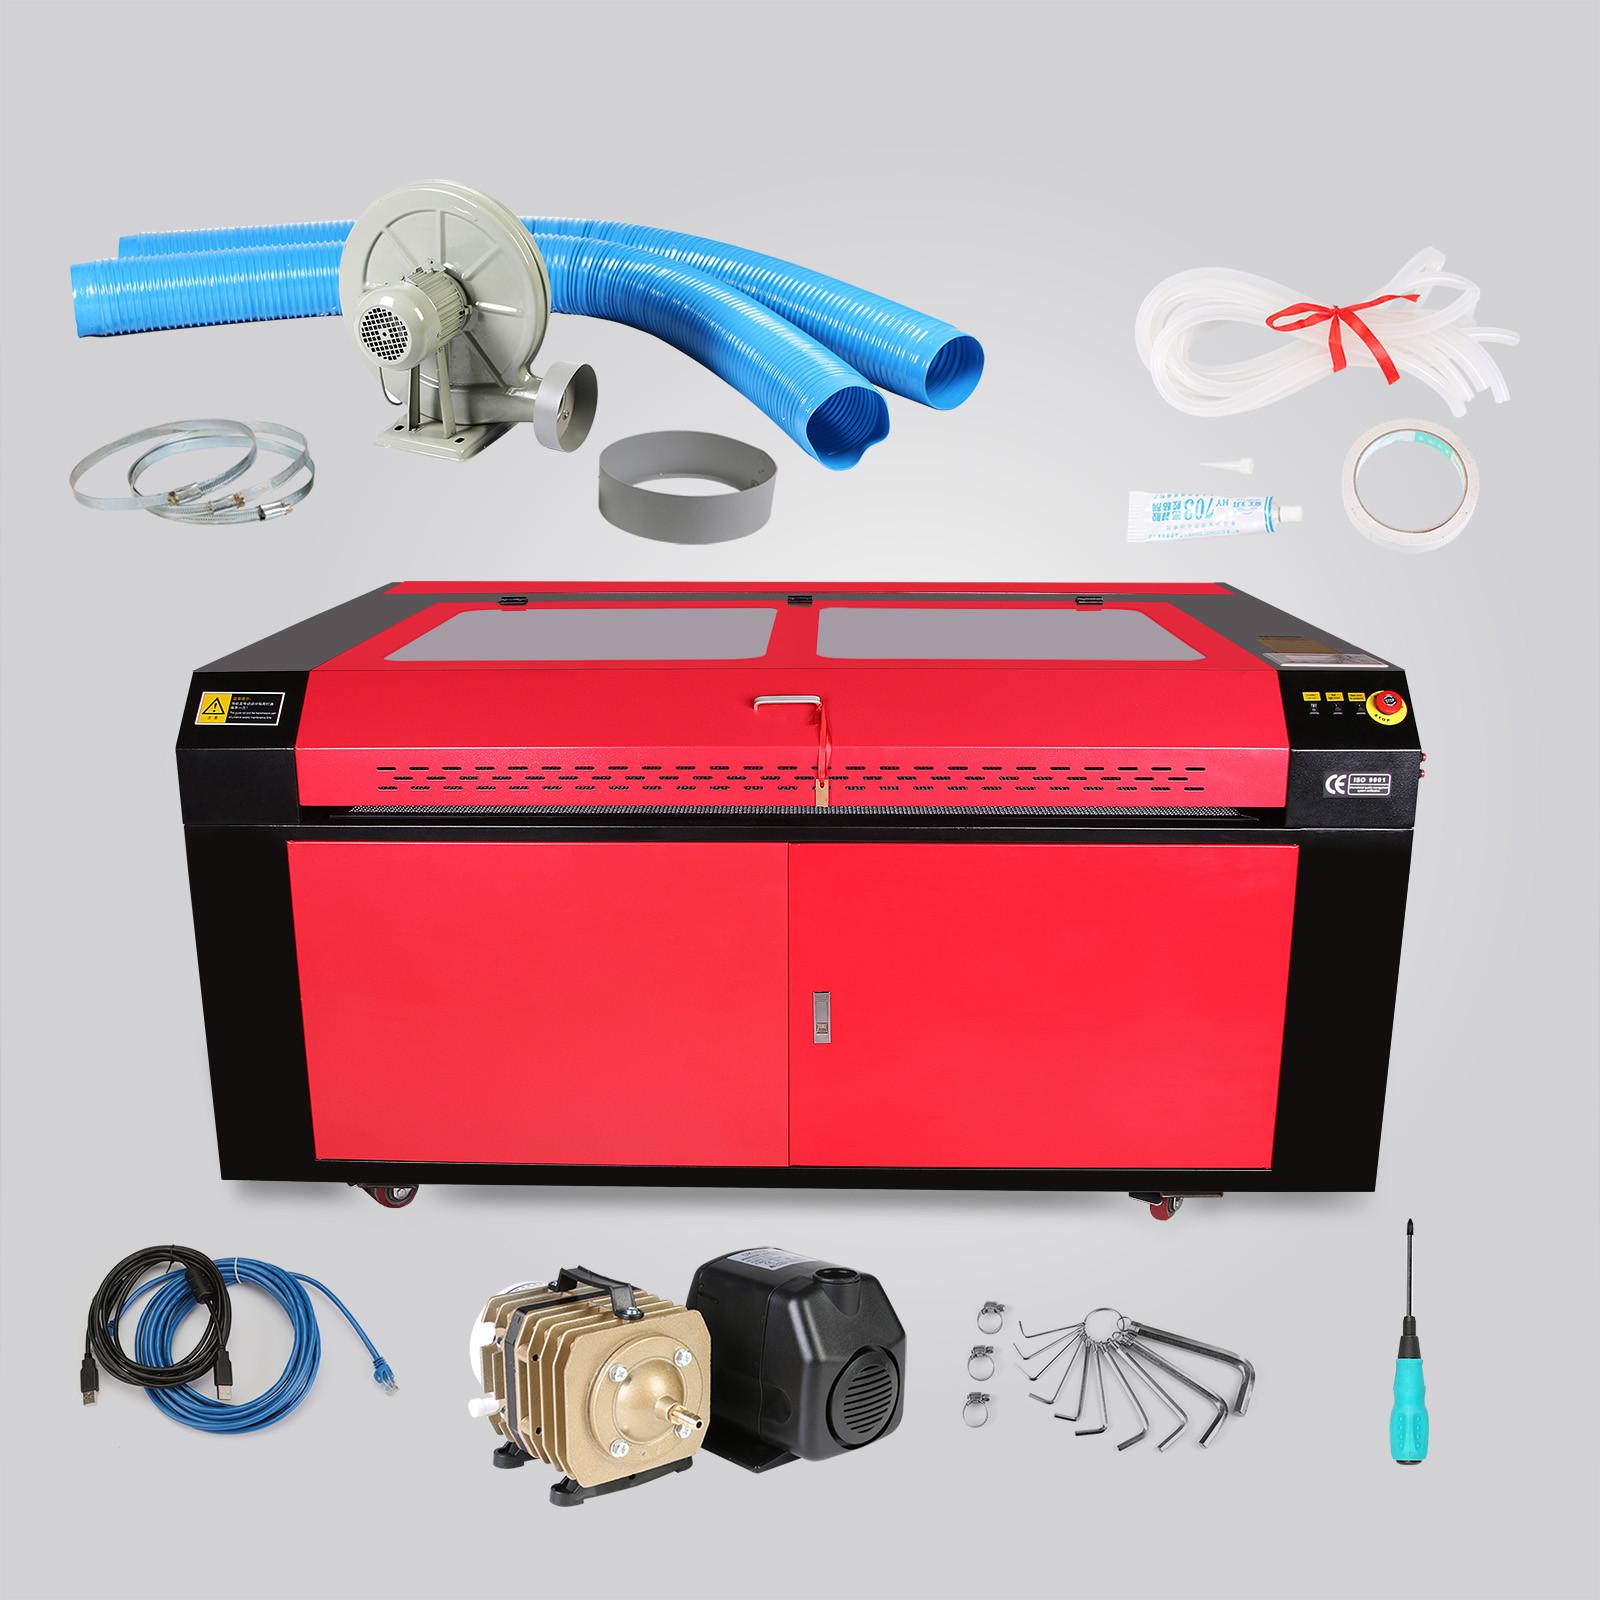 Macchina-per-Incisione-Laser-CO2-40-130W-Asse-Rotante-Tagliatrice-Incisore miniatura 72